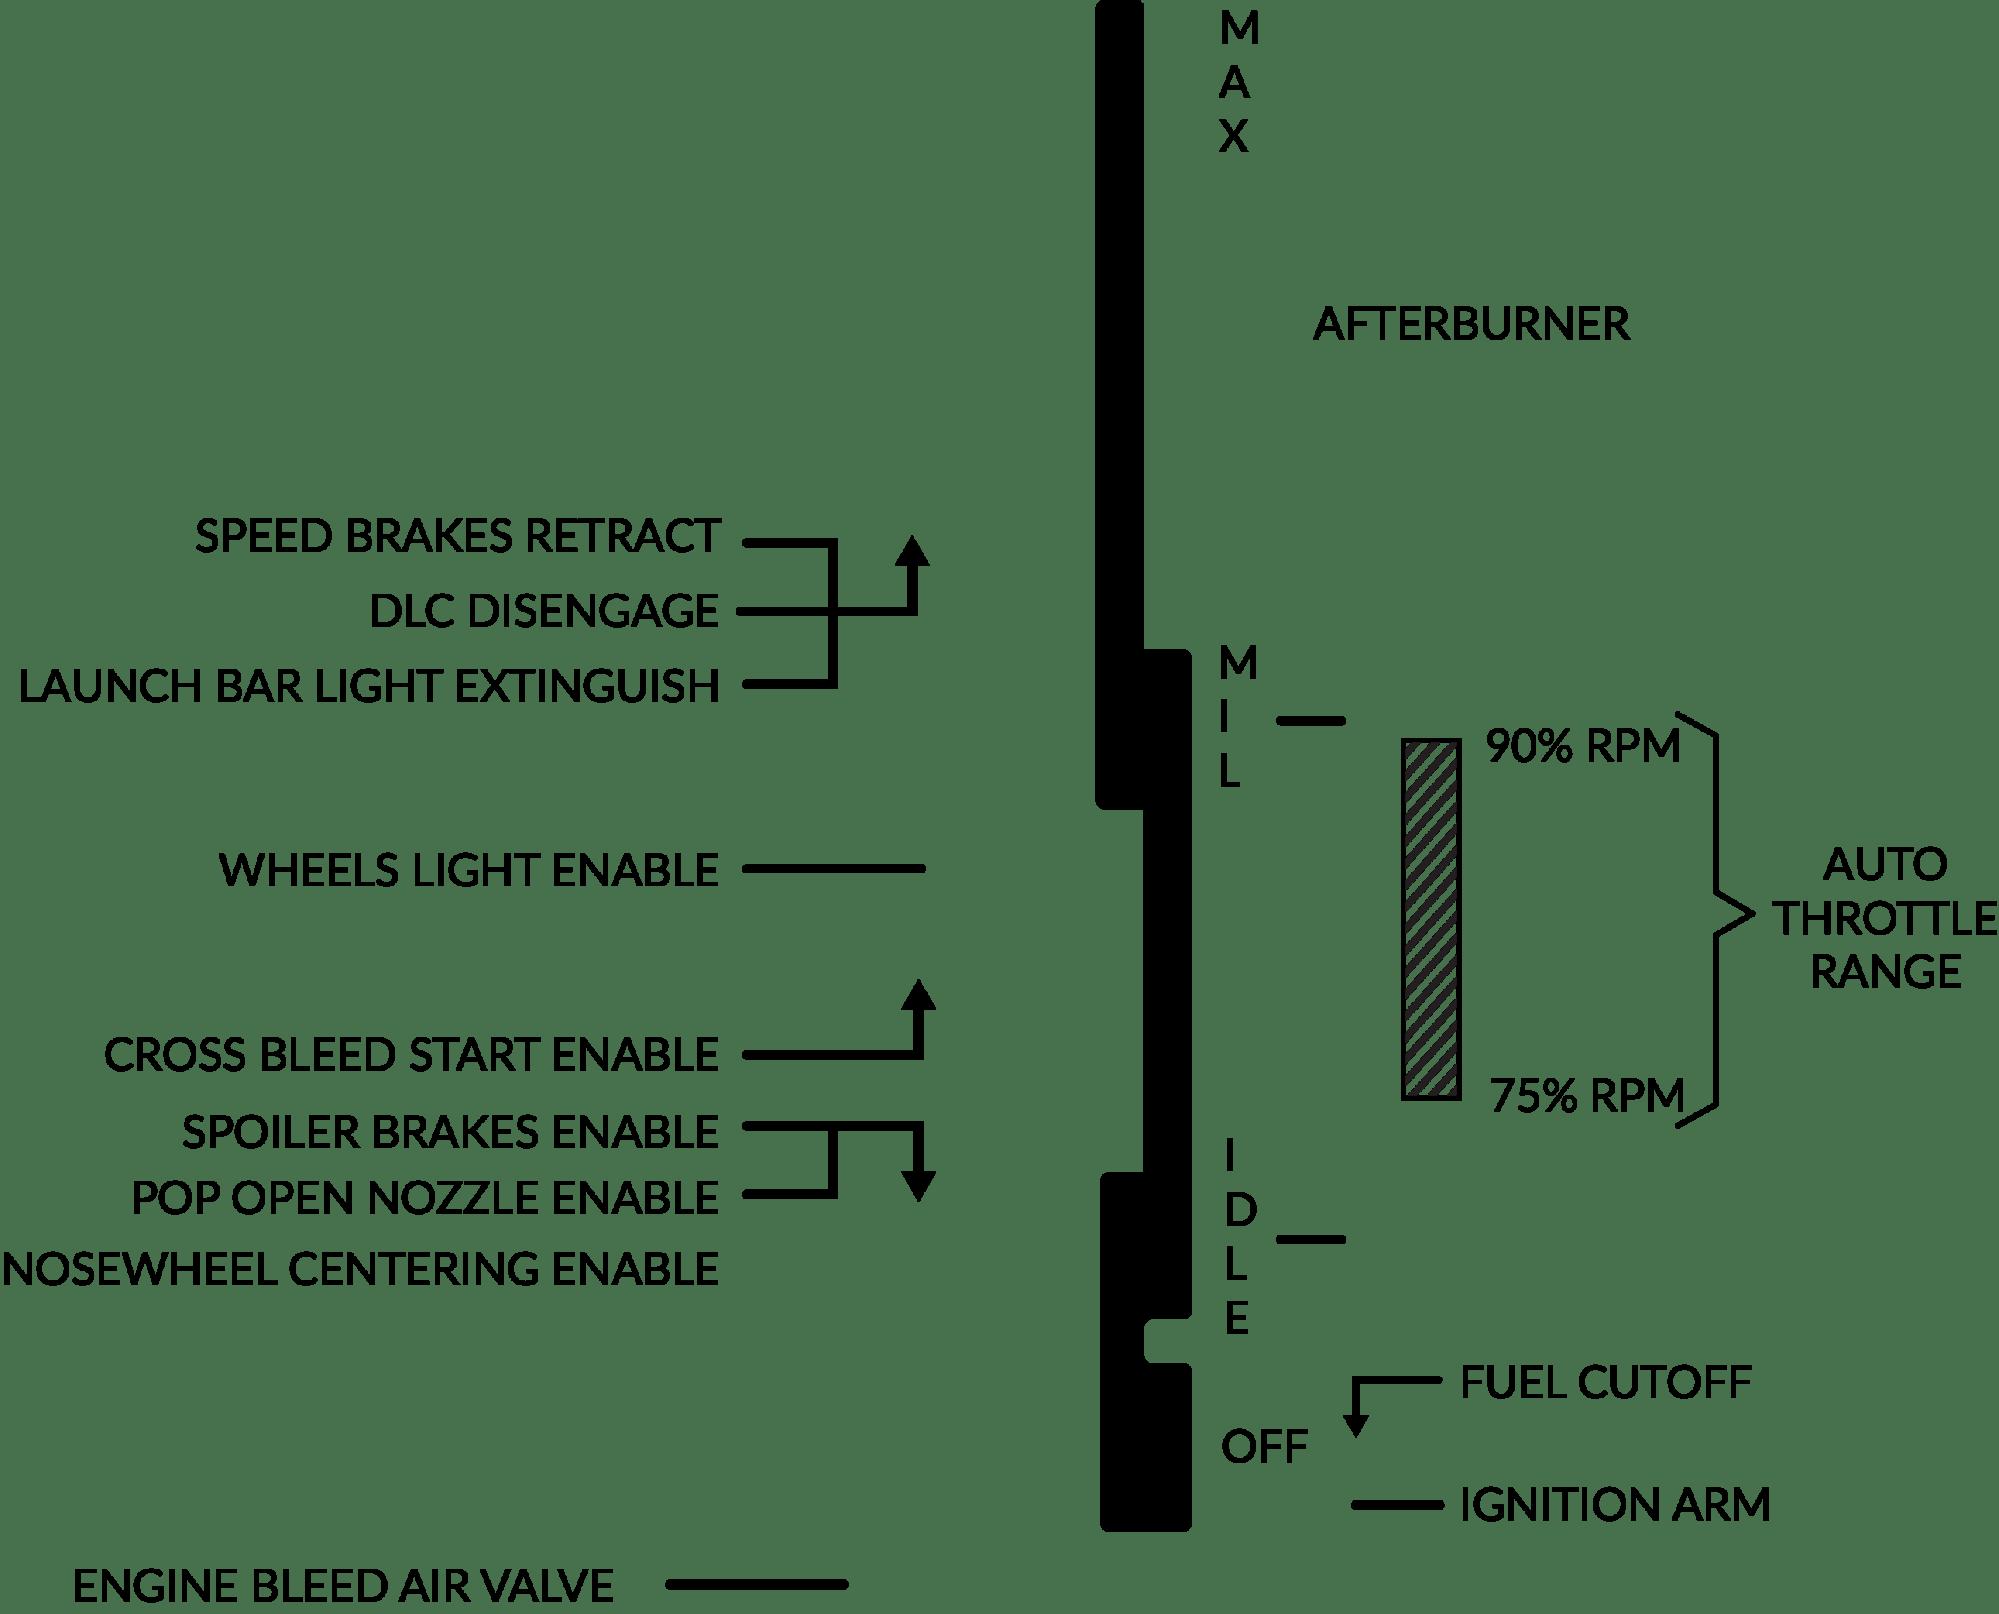 hight resolution of throttle controls